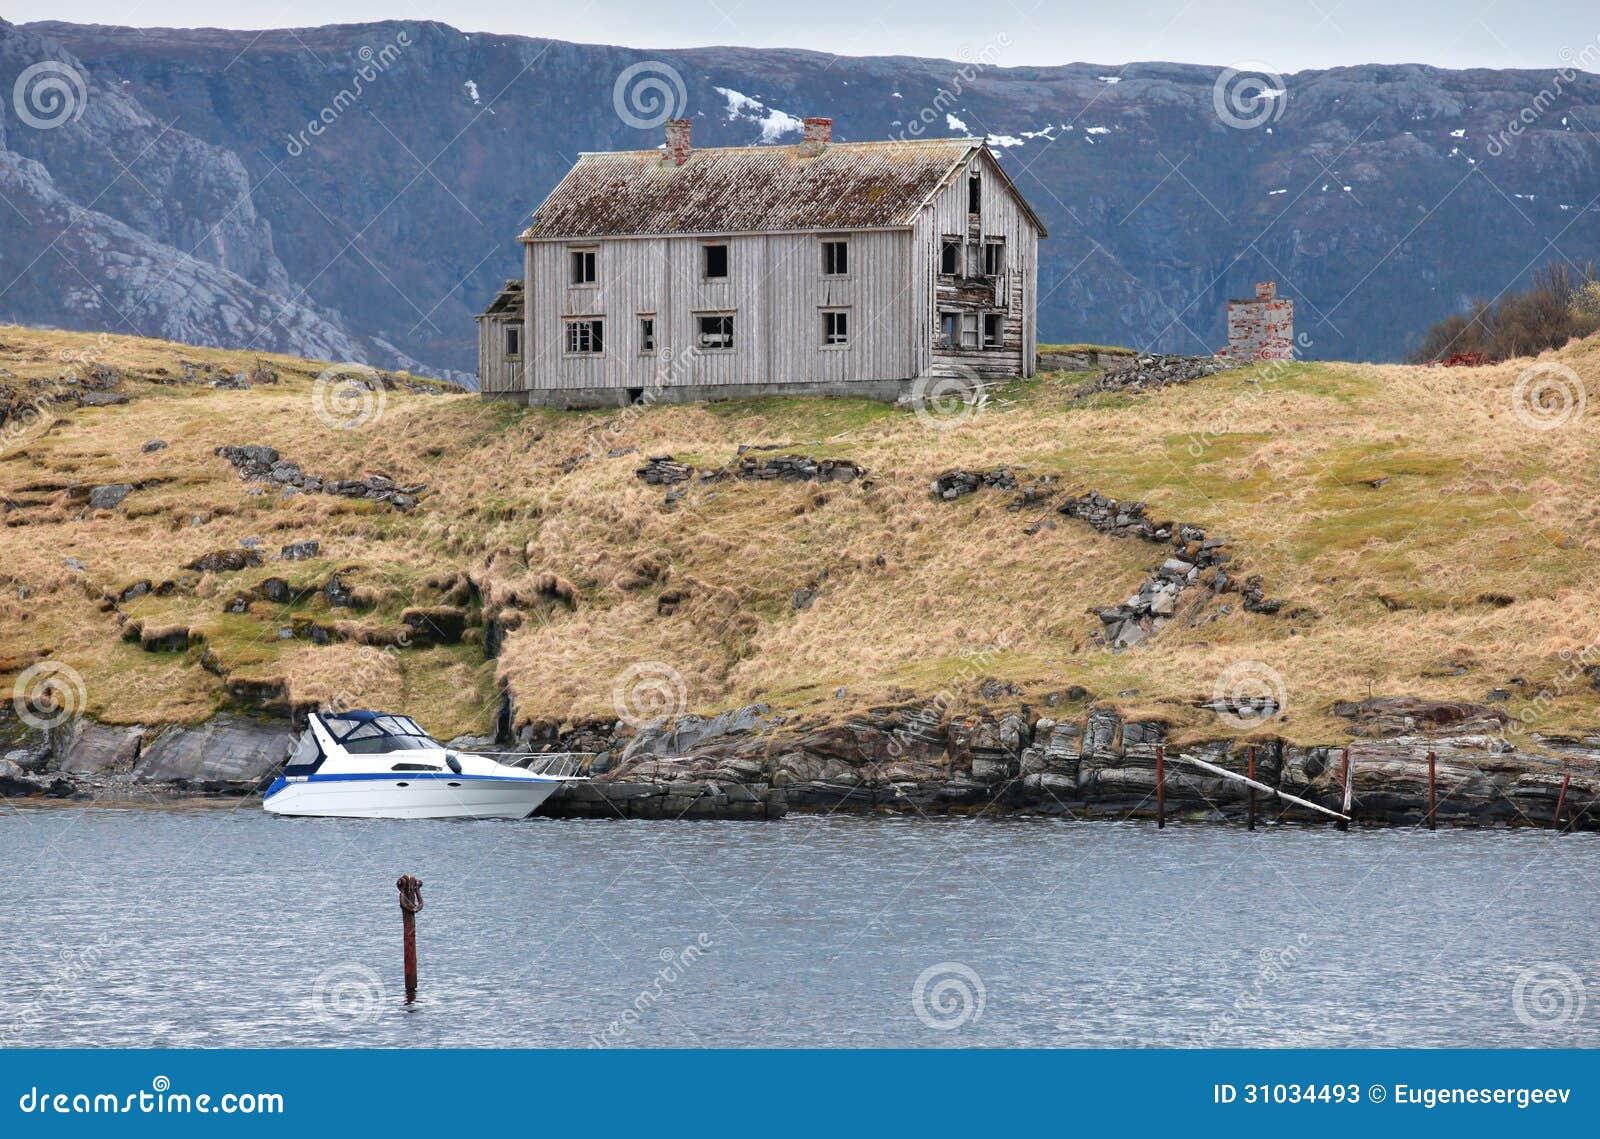 altes verlassenes graues holzhaus in norwegen stockbild bild von leer blau 31034493. Black Bedroom Furniture Sets. Home Design Ideas